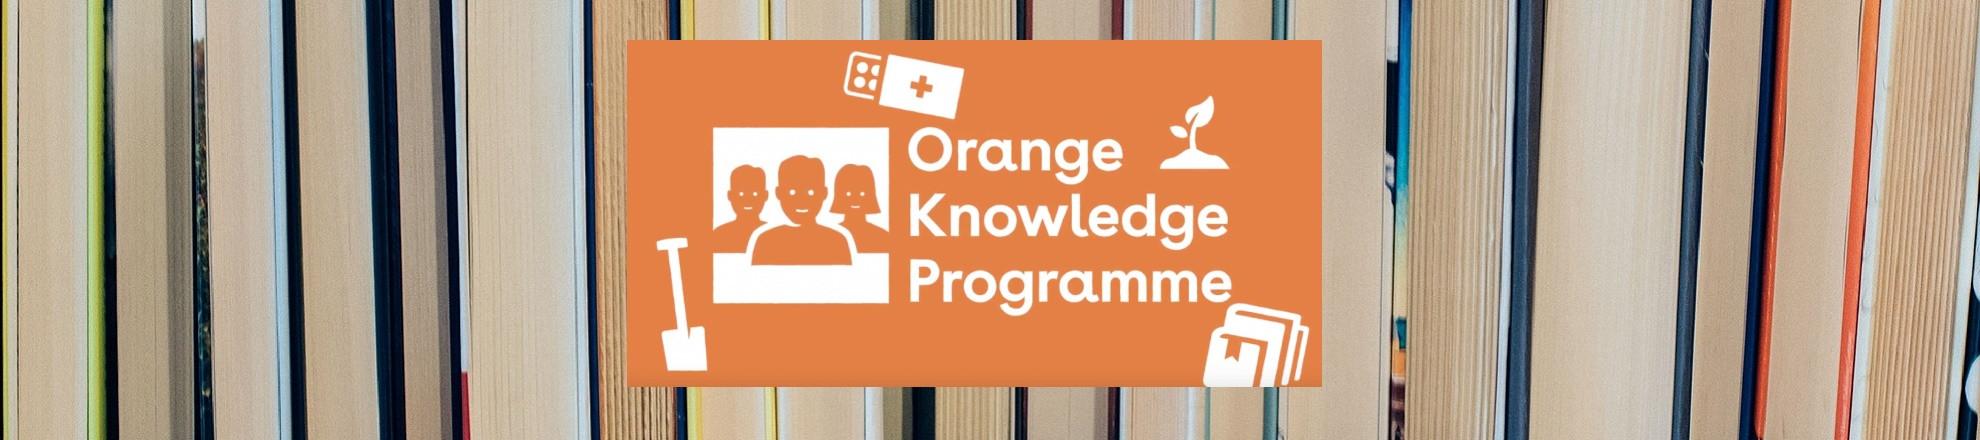 Scholarship Orange Knowledge Programme